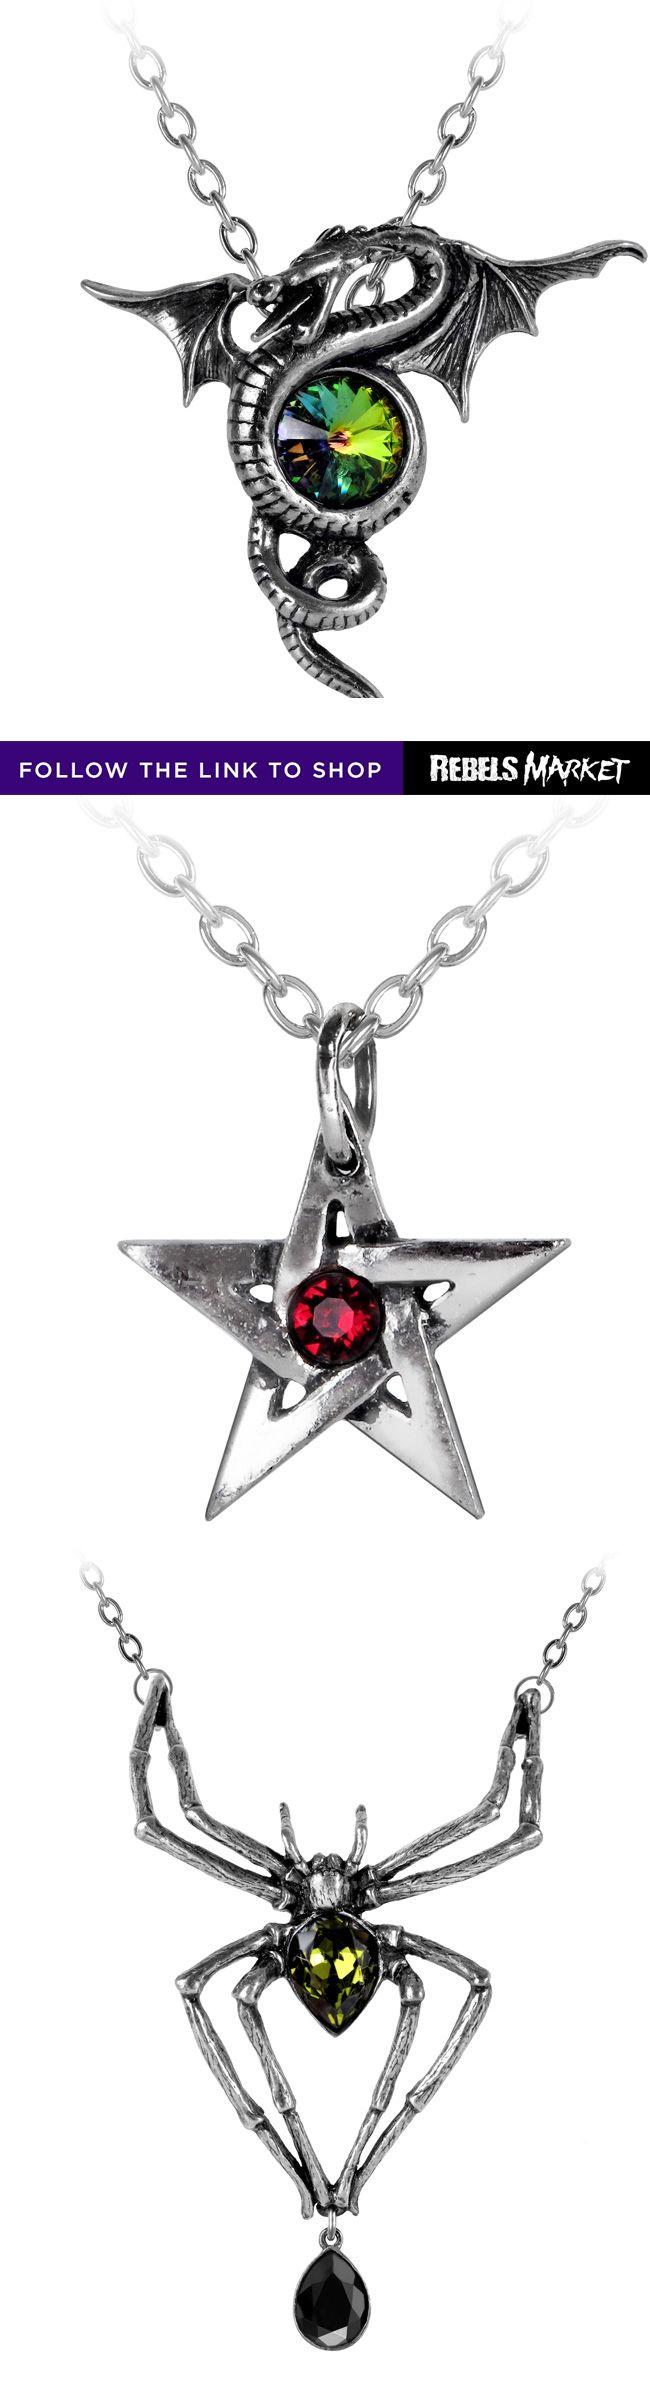 Shop gothic necklaces online at RebelsMarket.